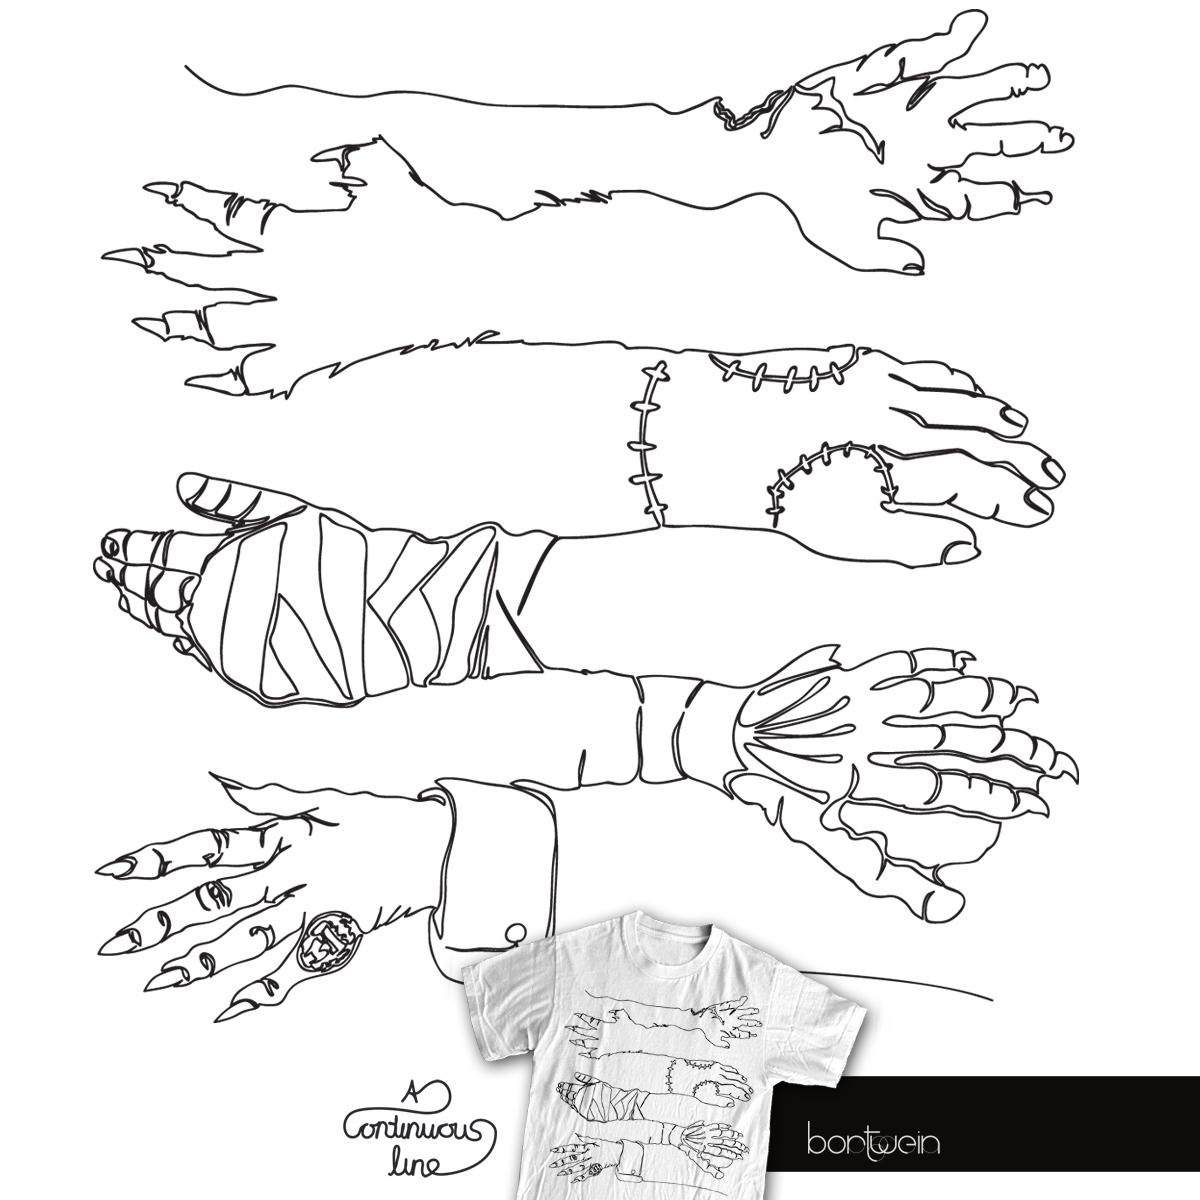 Horror Hands by bortwein on Threadless